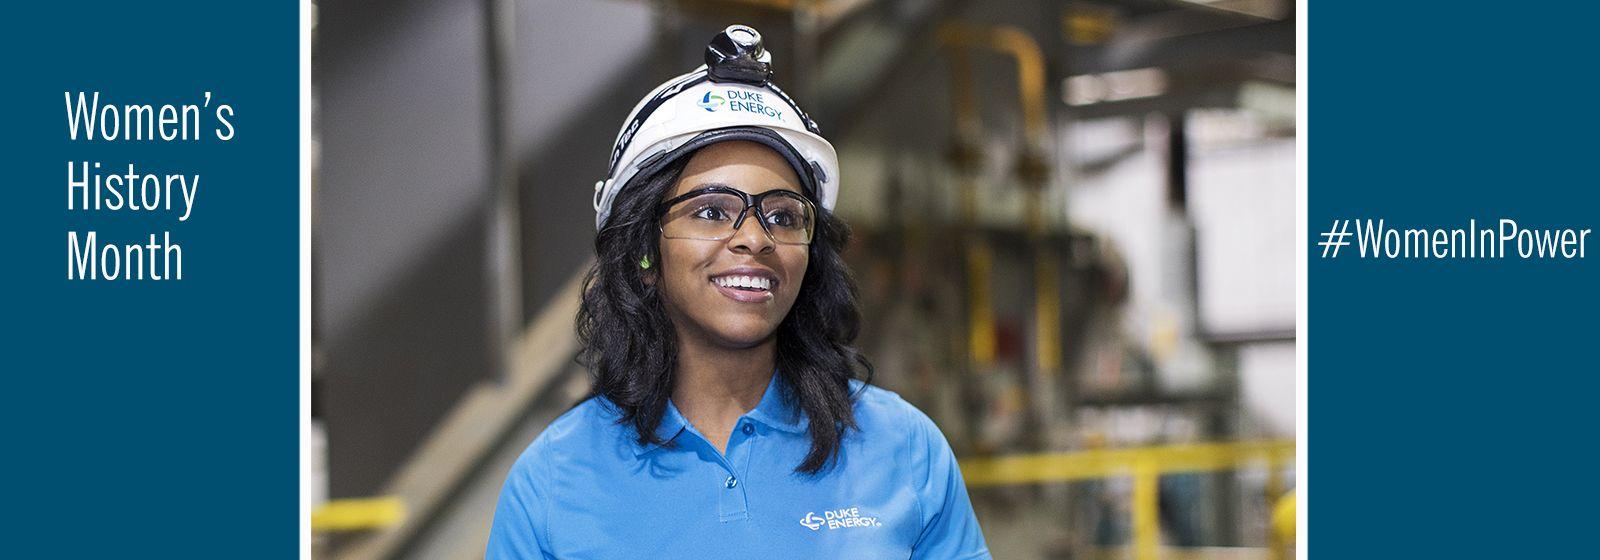 Meet Ashley Coleman, civil engineer